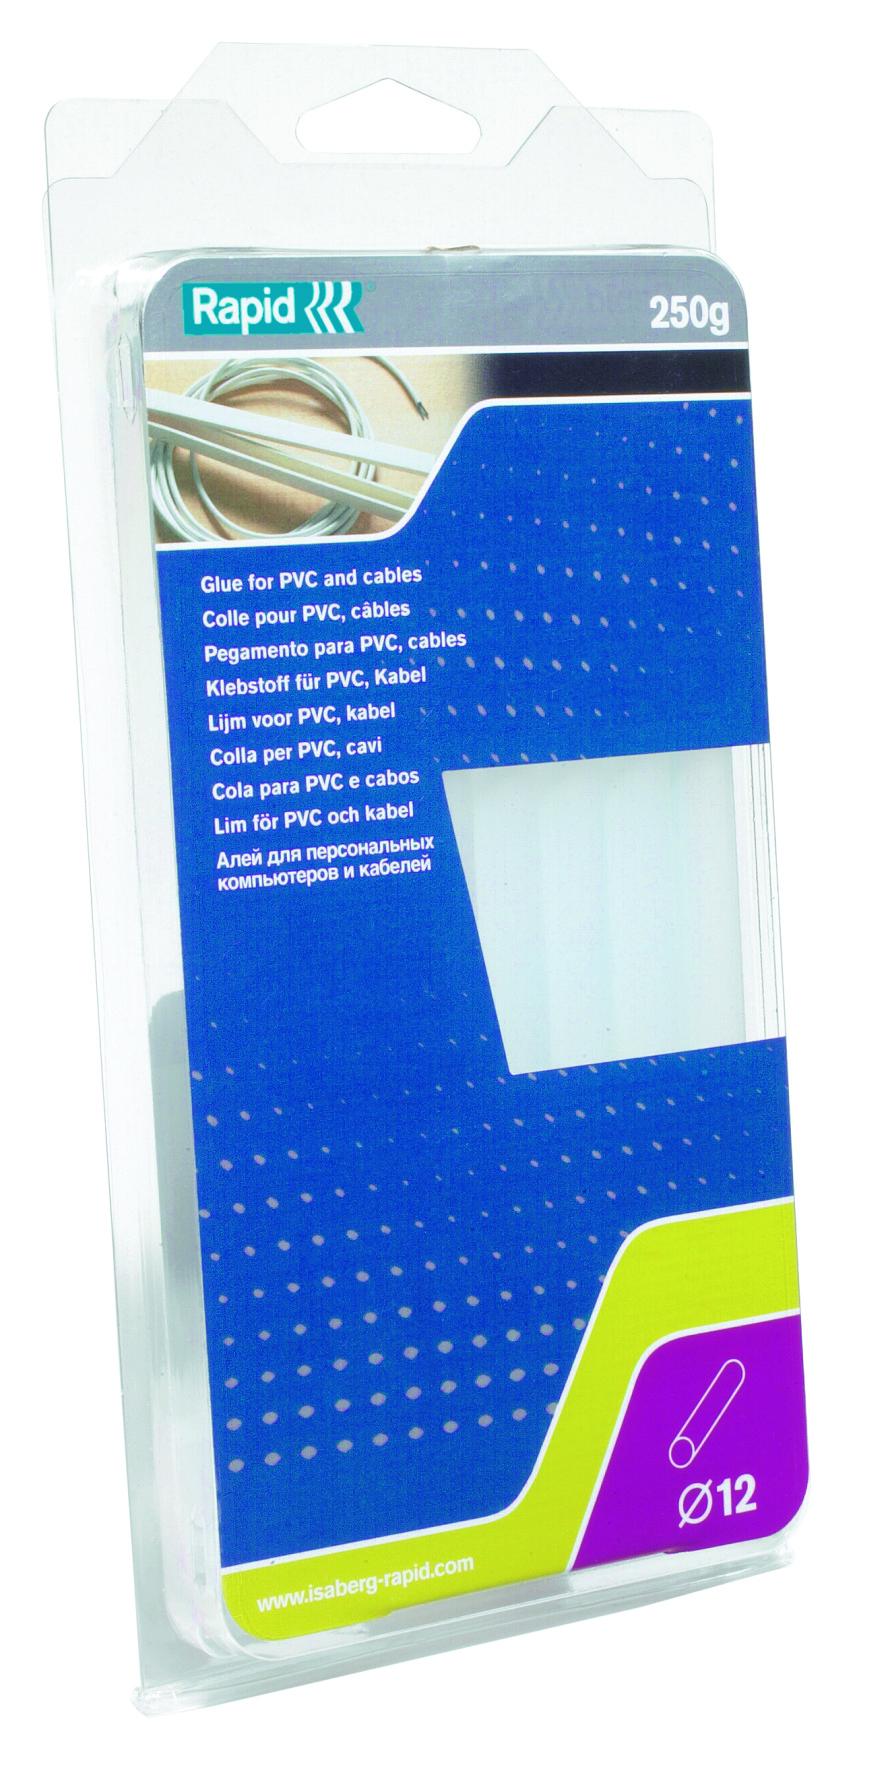 Rapid Lijmpatronen PVC Kabel Transparant Ø12mm 250g